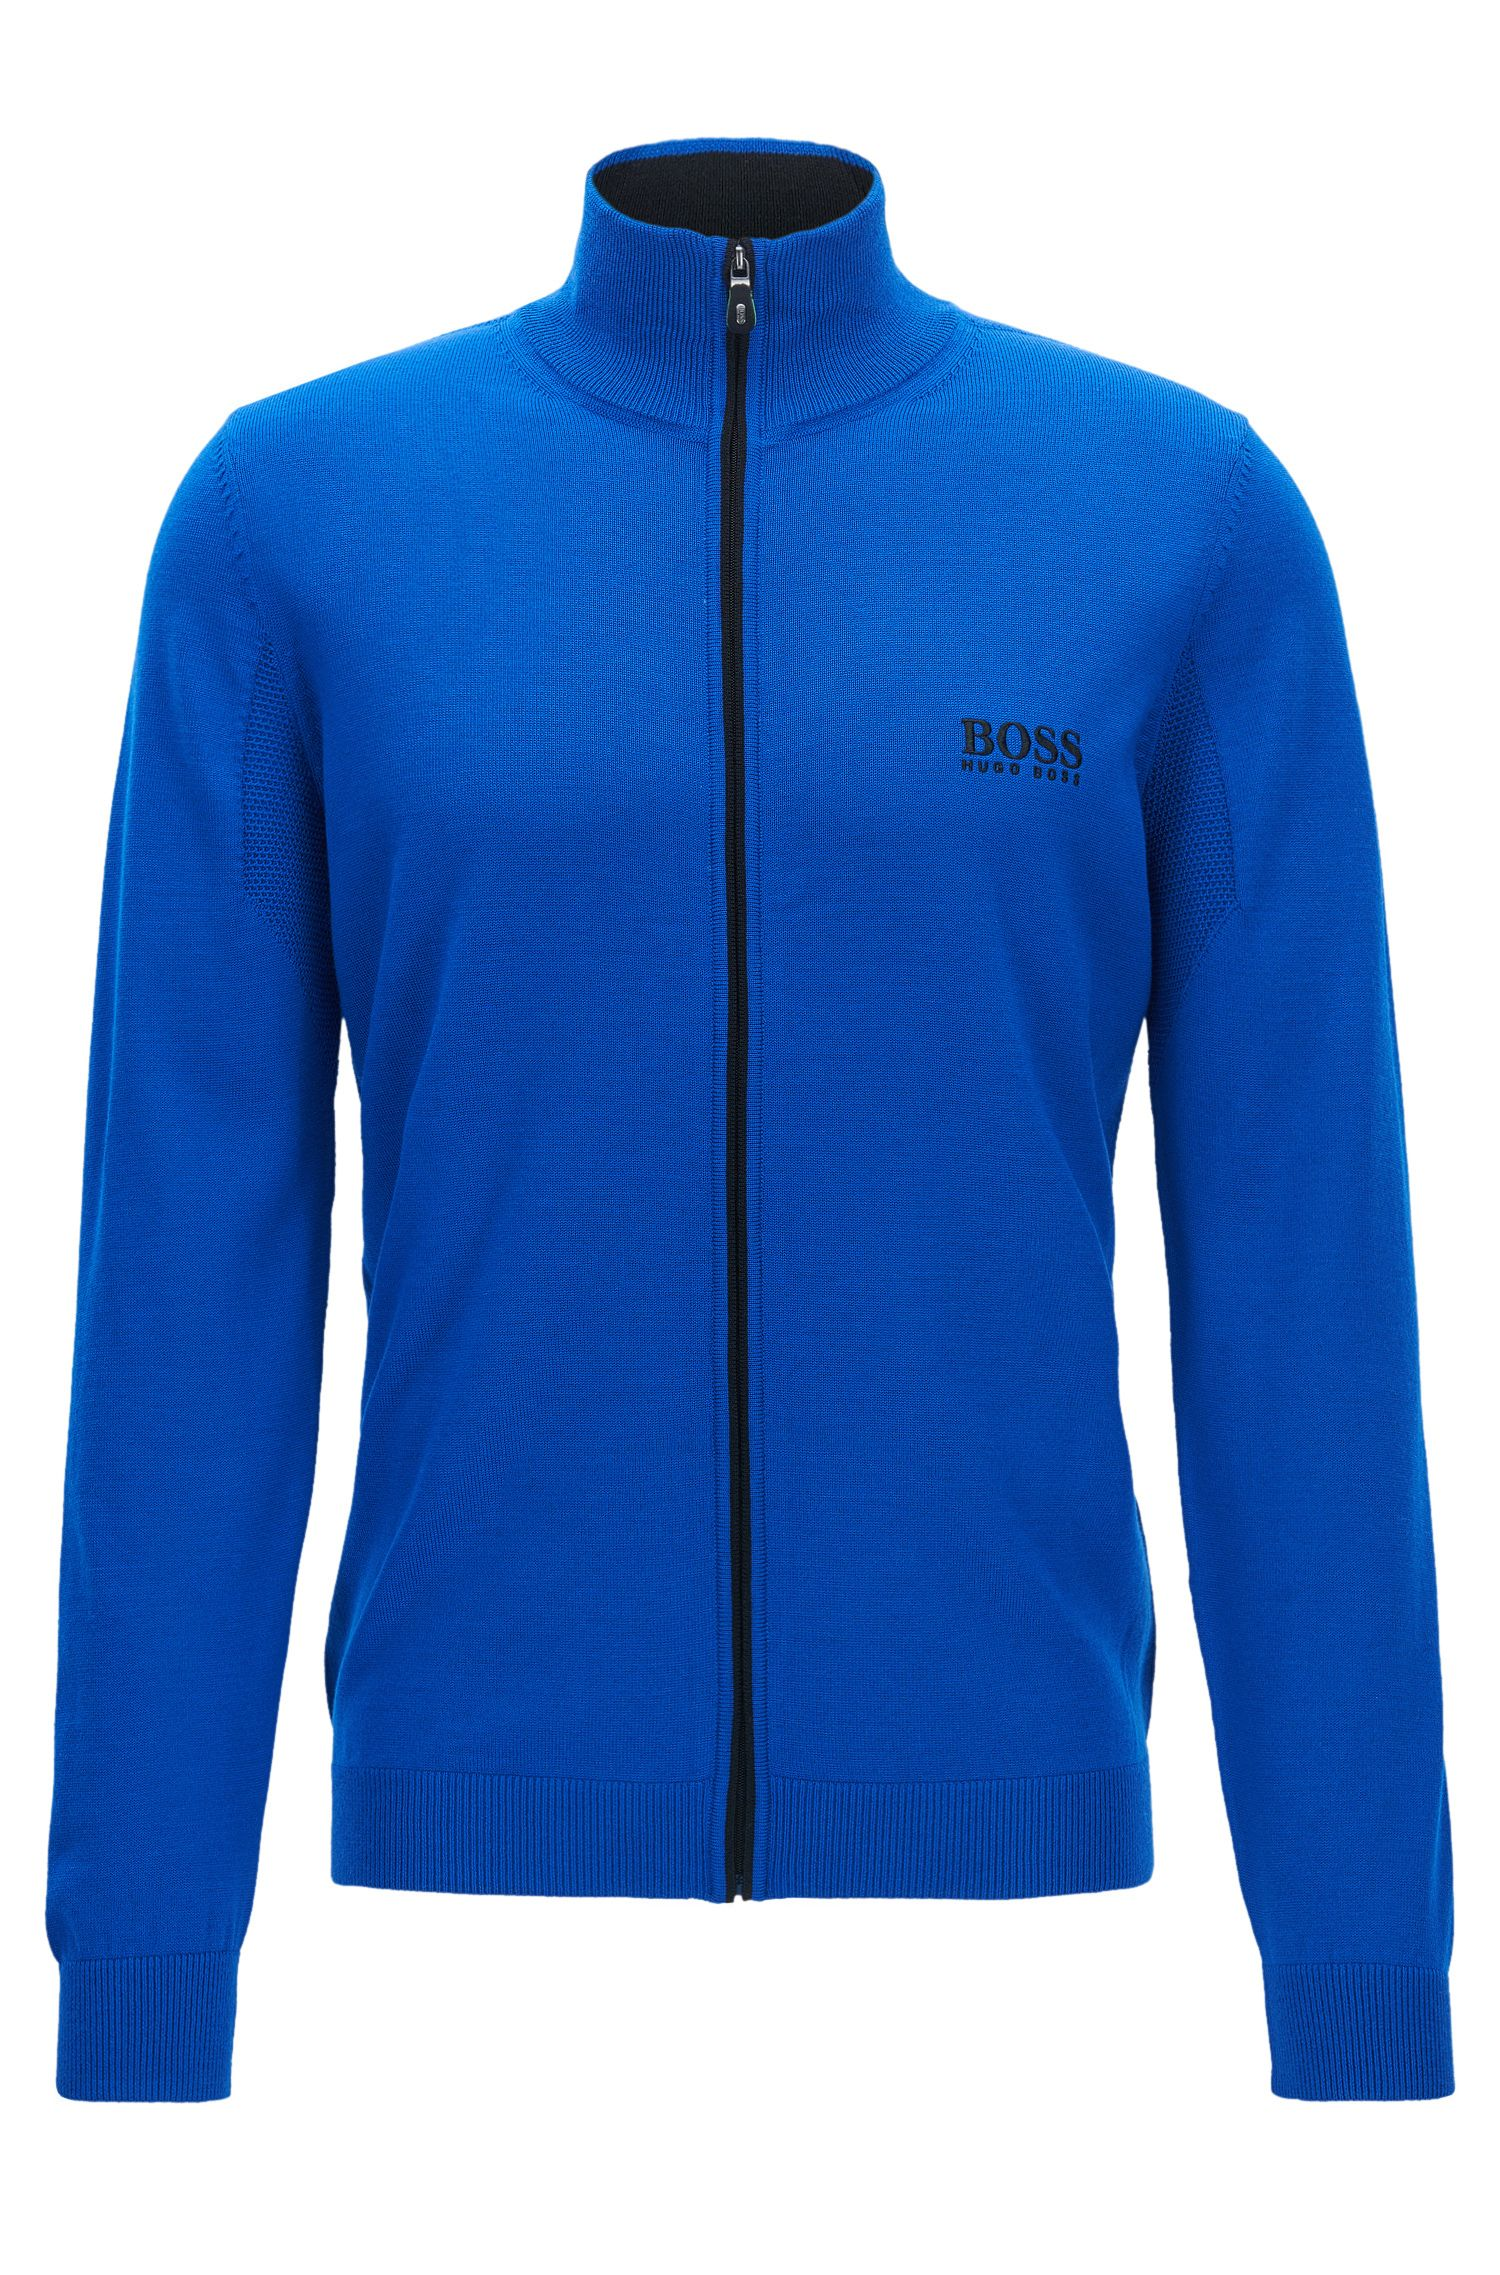 Virgin Wool Full-Zip Sweater Jacket | Zeen Pro